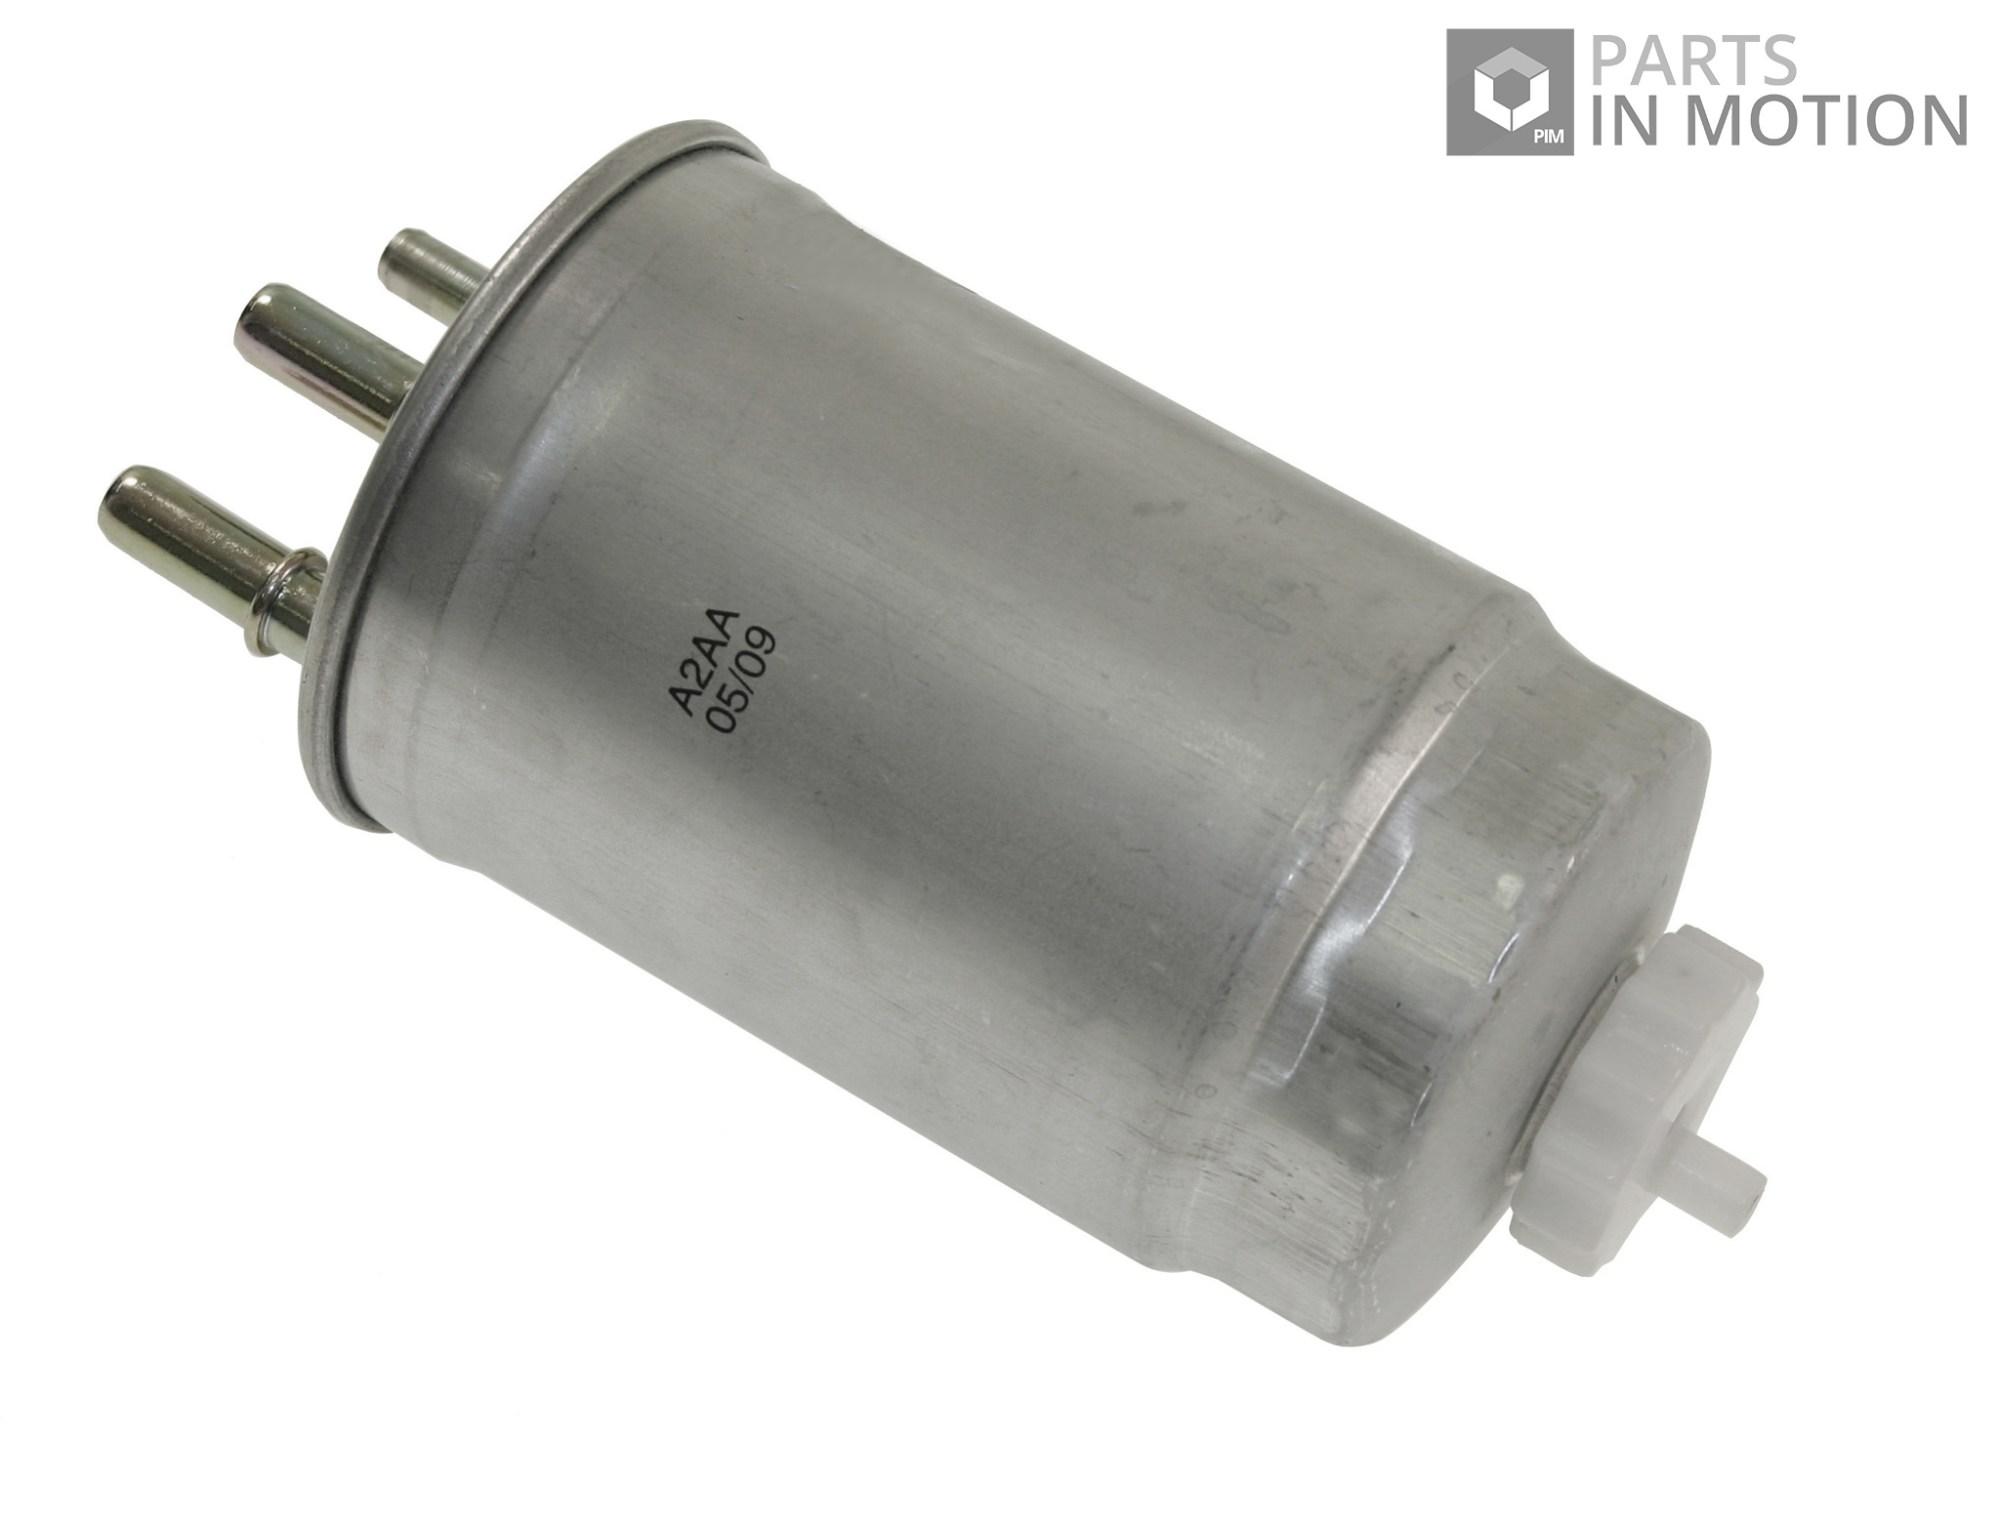 hight resolution of fuel filter fits kia sedona 2 9d 2001 on adg02342 blue